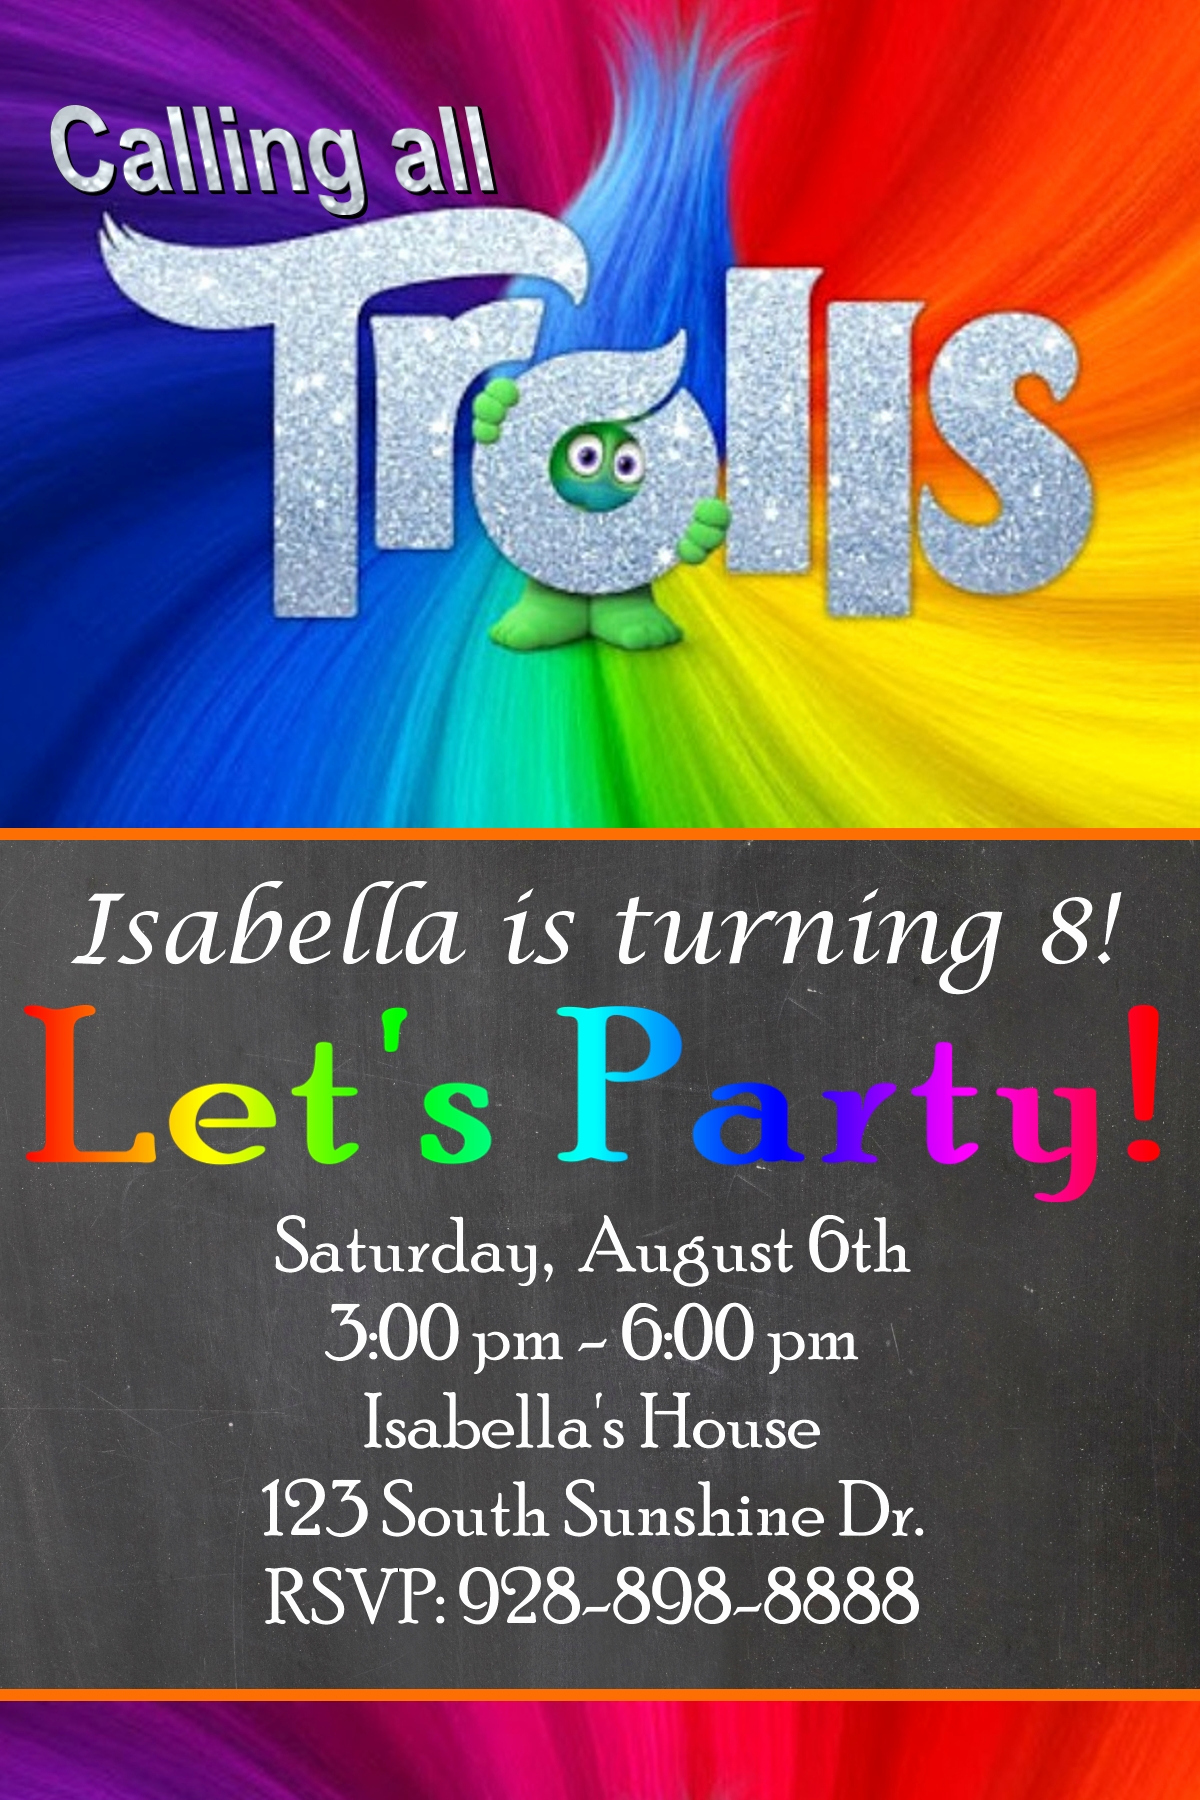 Free Trolls Invitation Template New Free Trolls Birthday Party Invitation Printables